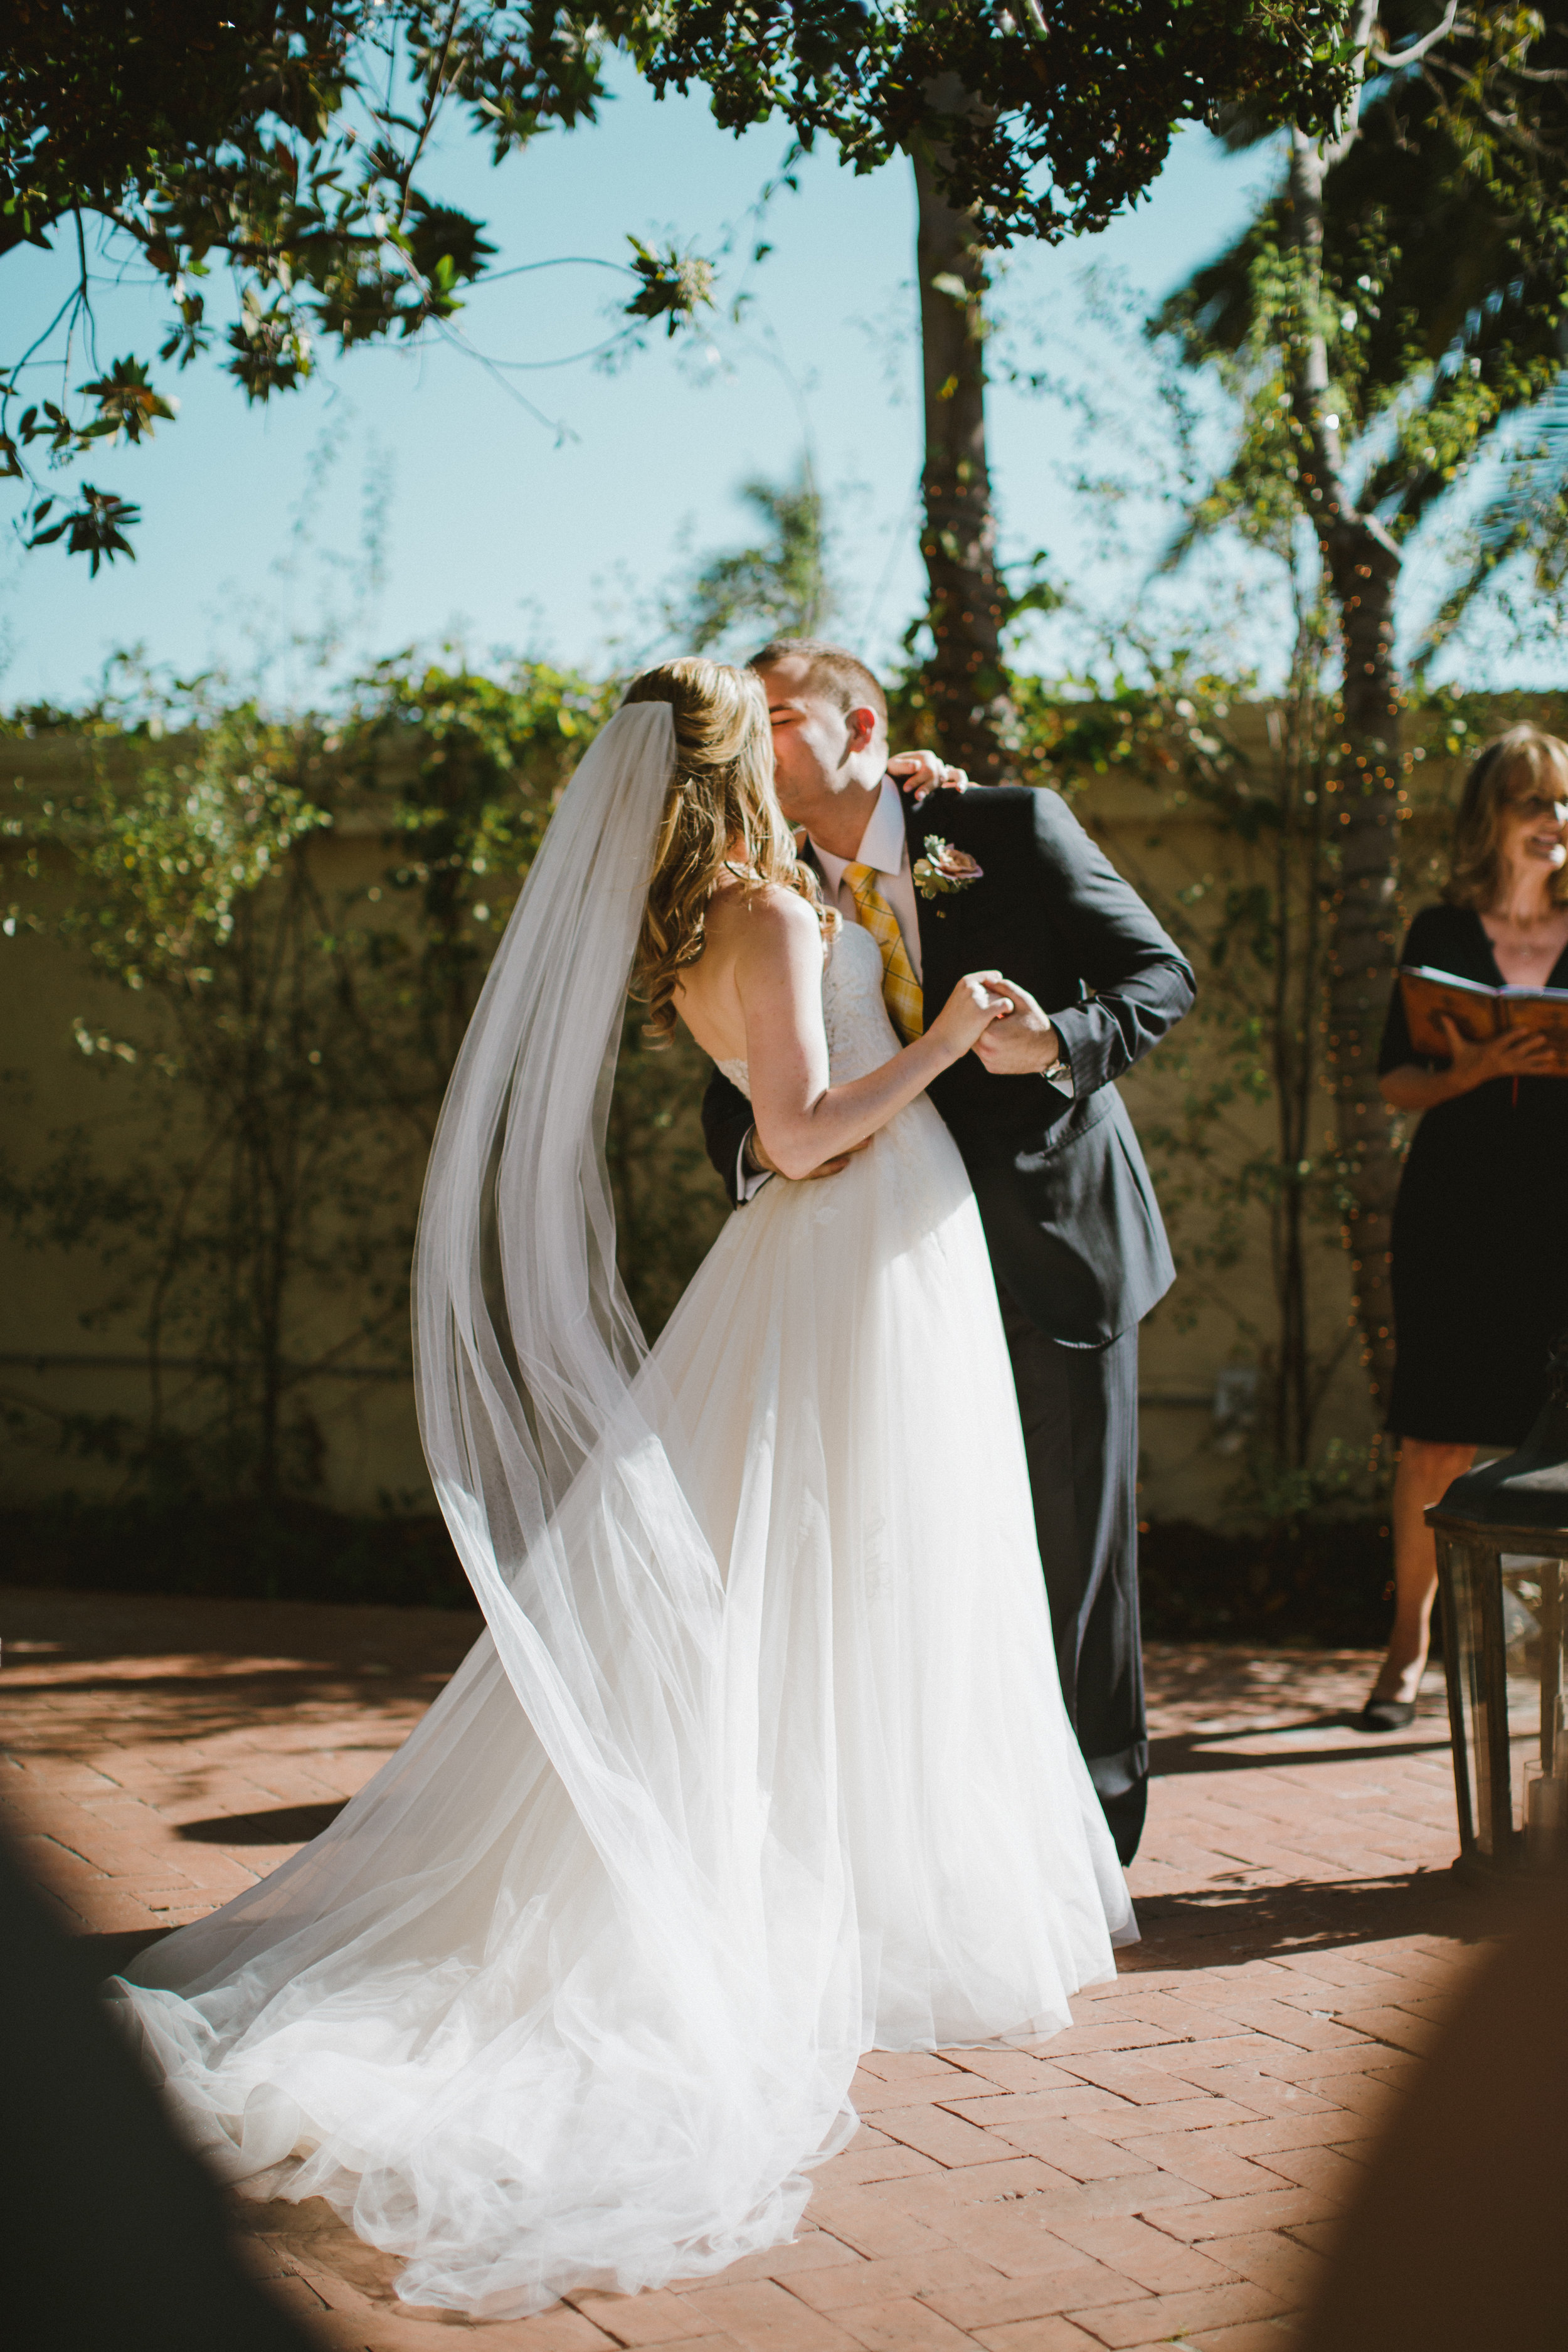 www.santabarbarawedding.com | Ryanne Bee Photography | The Santa Barbara Club | Santa Barbara Classic Weddings | Bride and Groom First Kiss